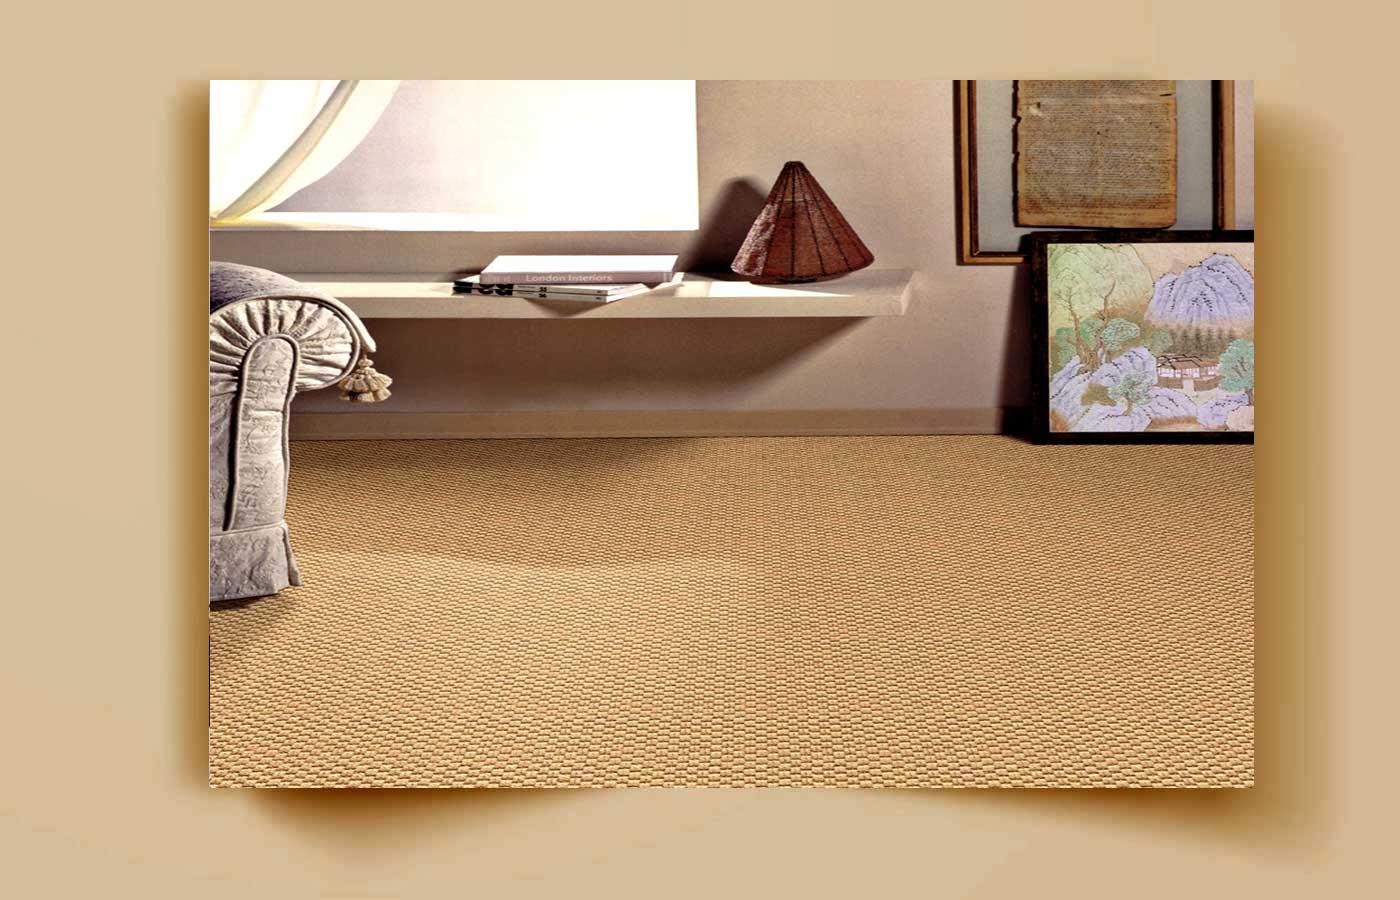 Floor Covering 00 - کف و کف پوش در طراحی داخلی